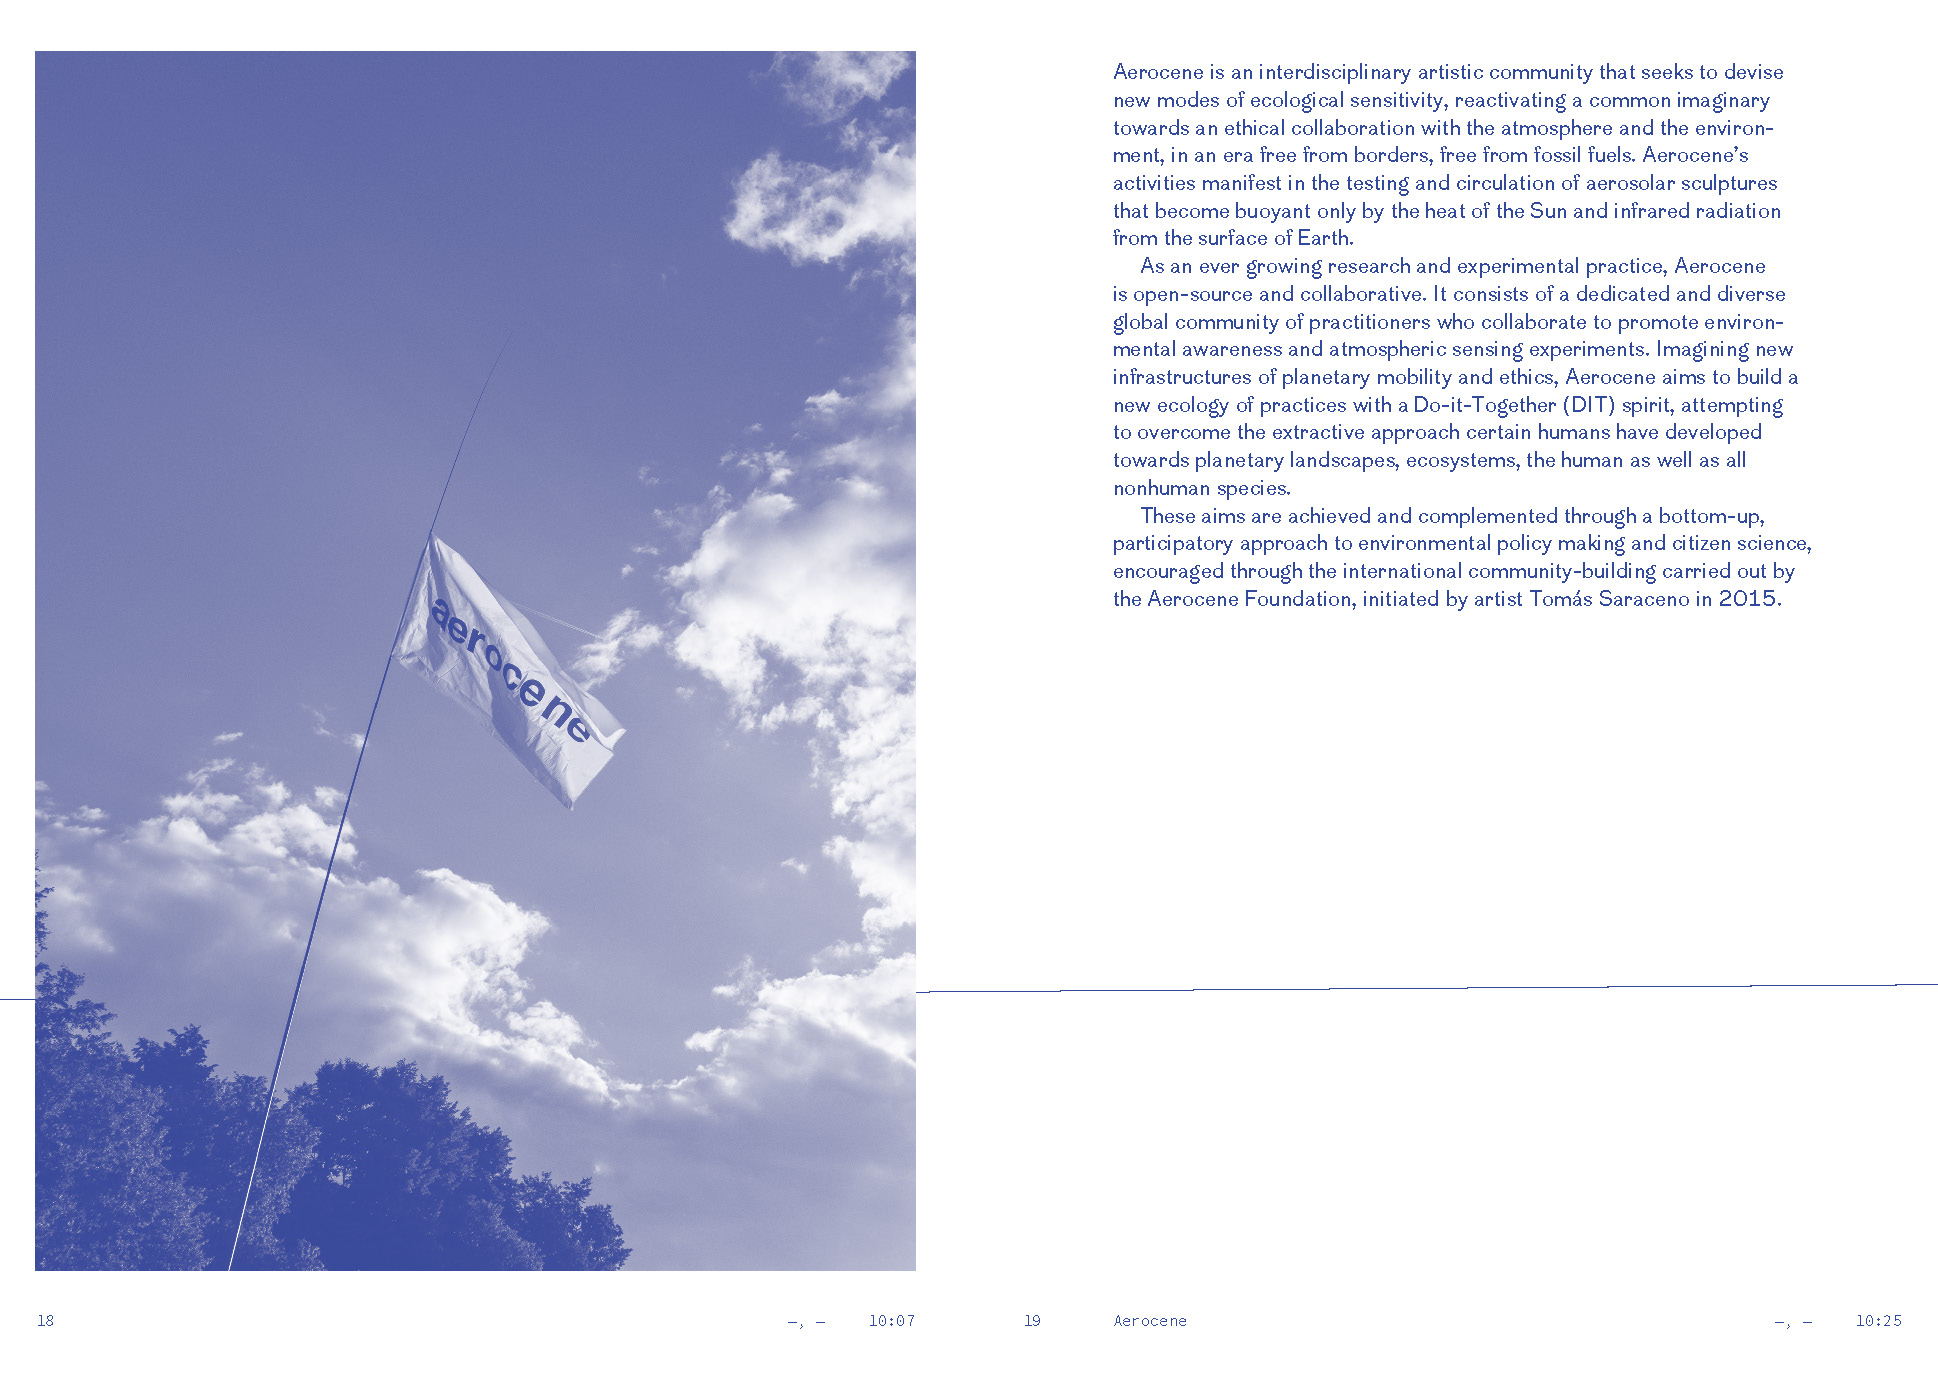 20AE_MovementsfortheAir_Aerocene (1)_Page_010